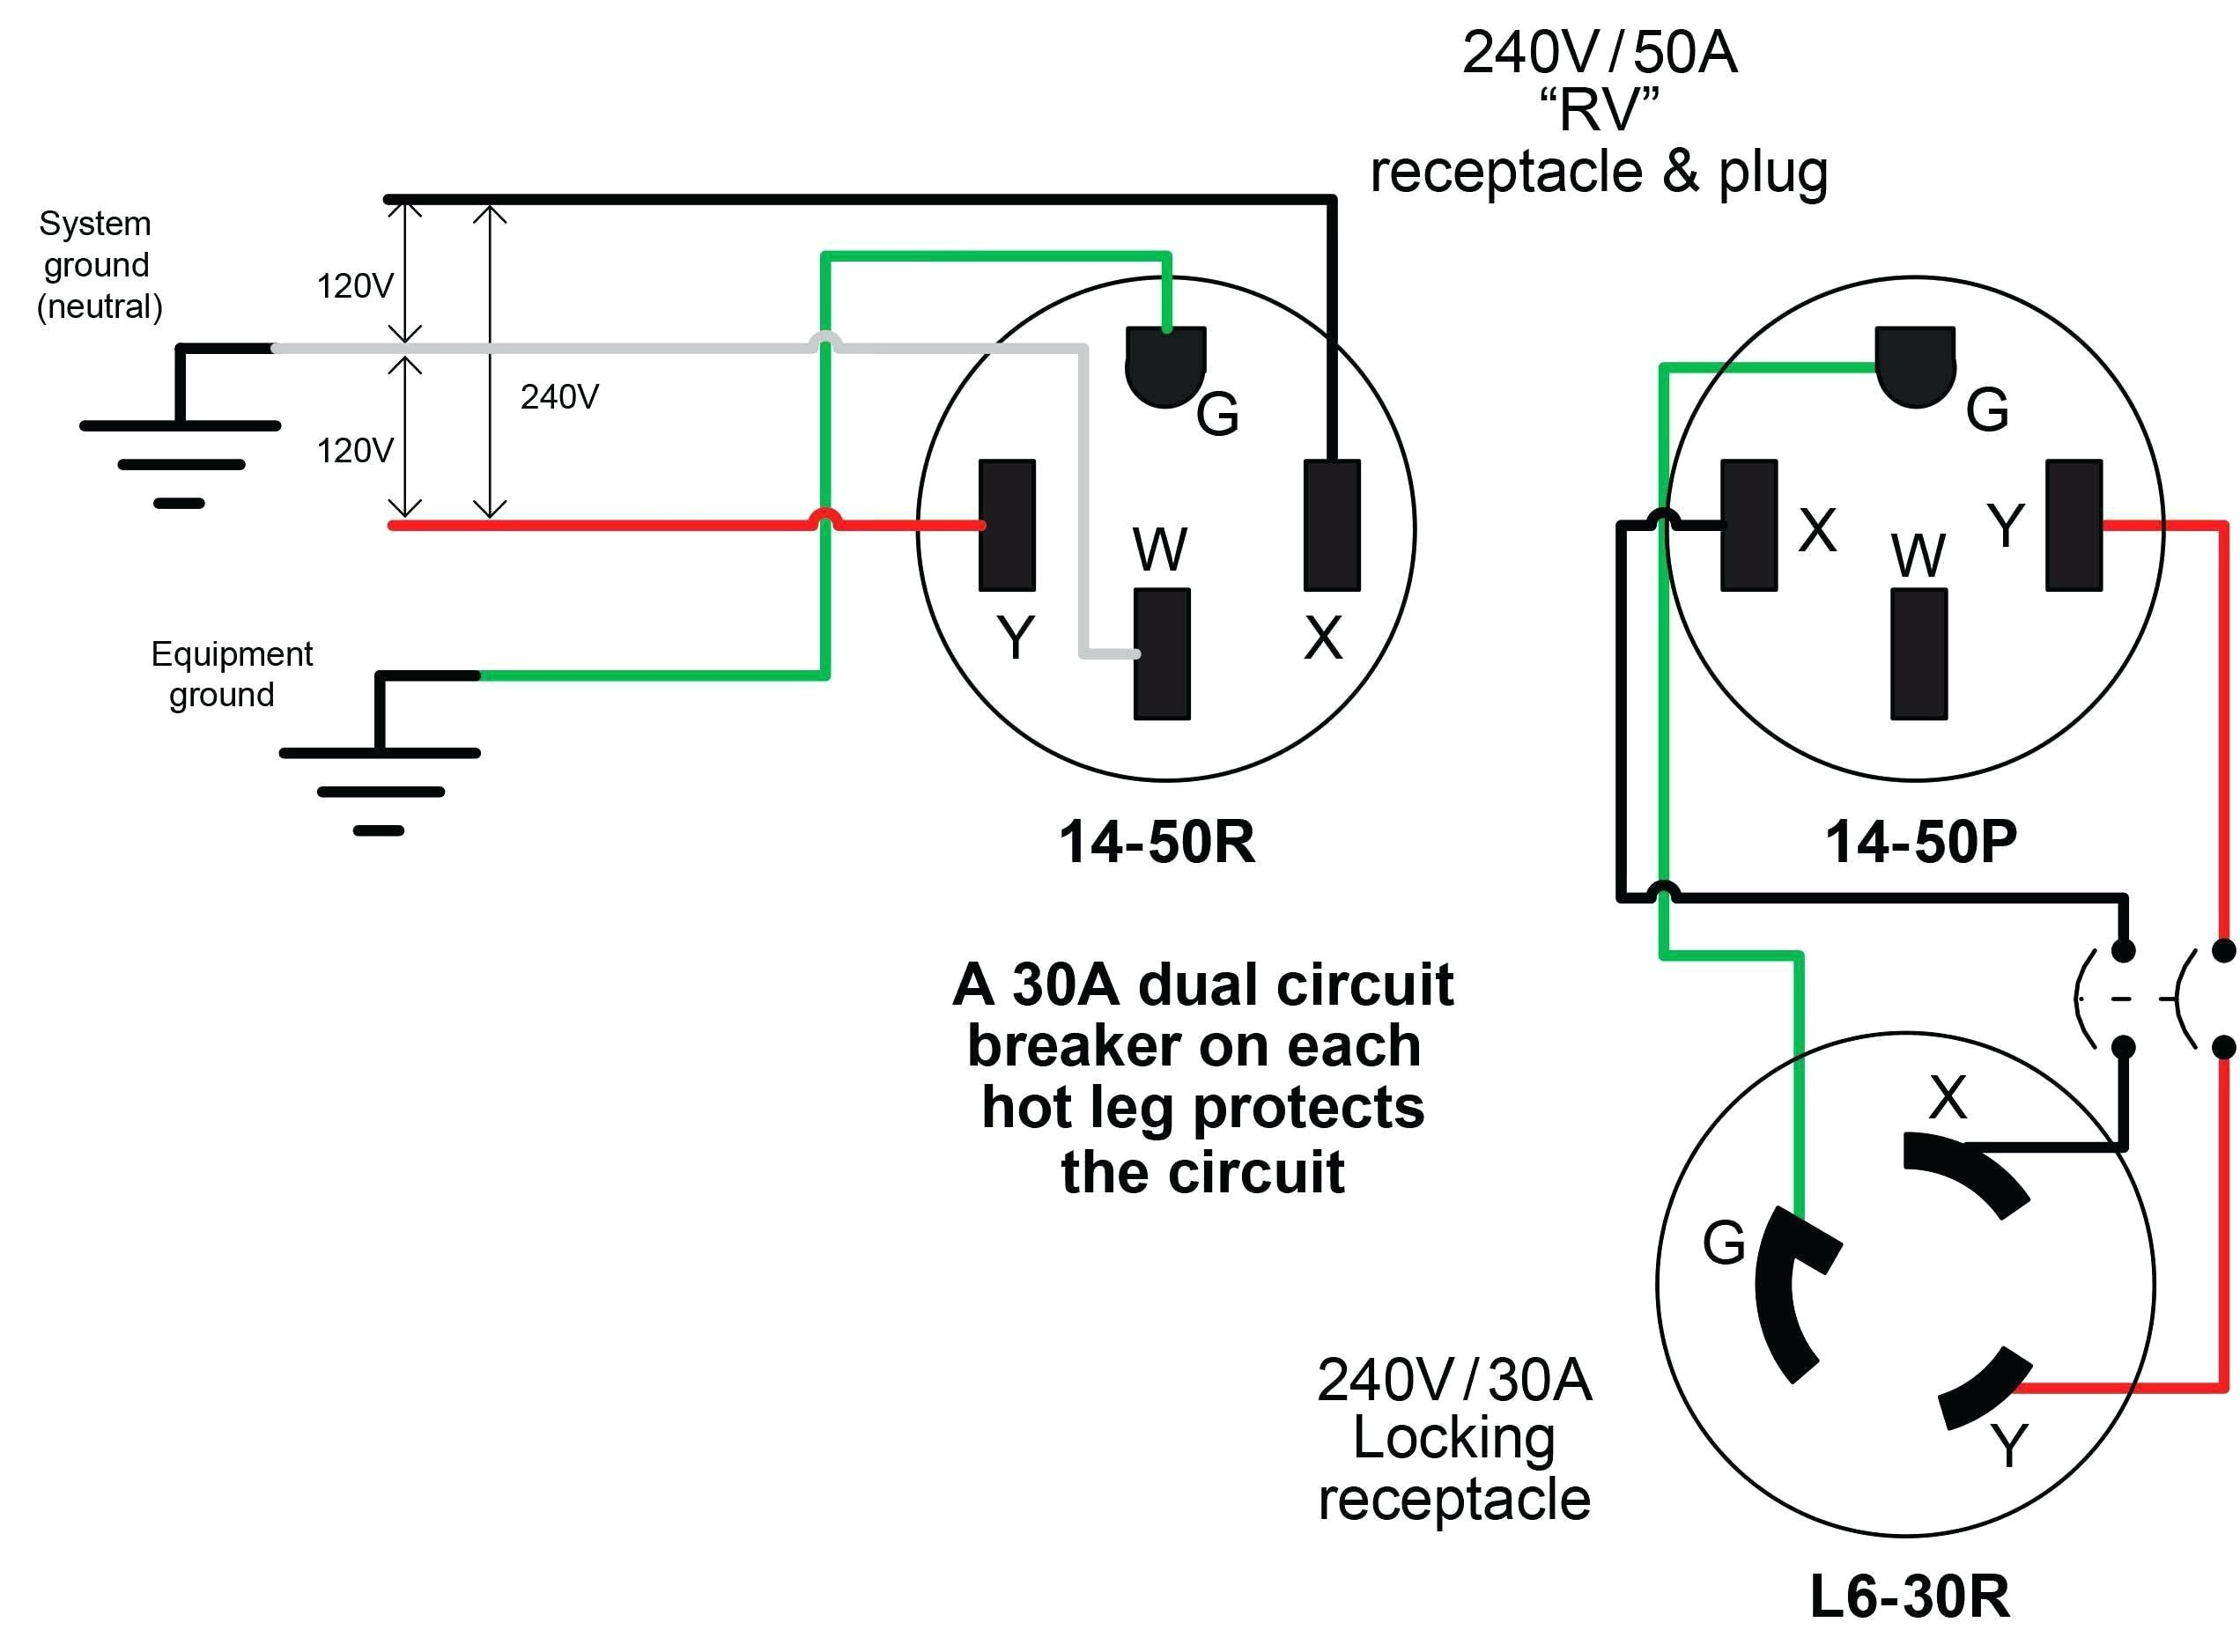 [FPWZ_2684]  Multiple Receptacle Wiring Diagram 110v - Auto Electrical Wiring Diagram | 110v Wiring Diagrams |  | Wiring Diagram